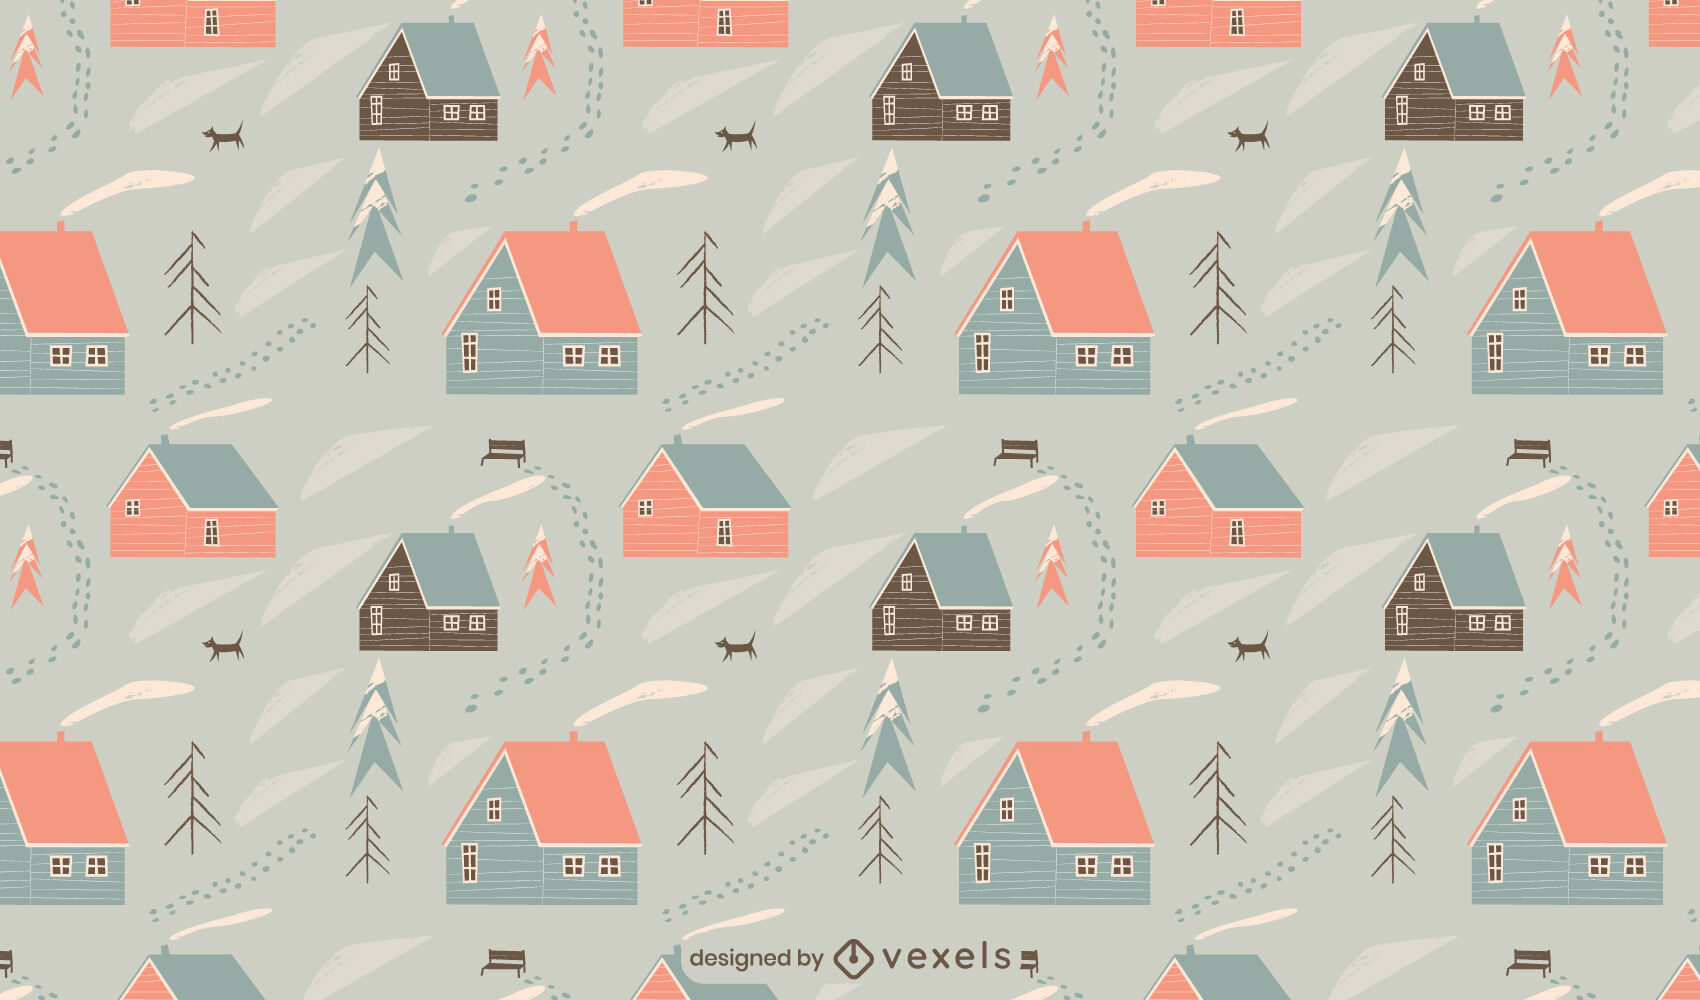 Winter season cabin houses pattern design